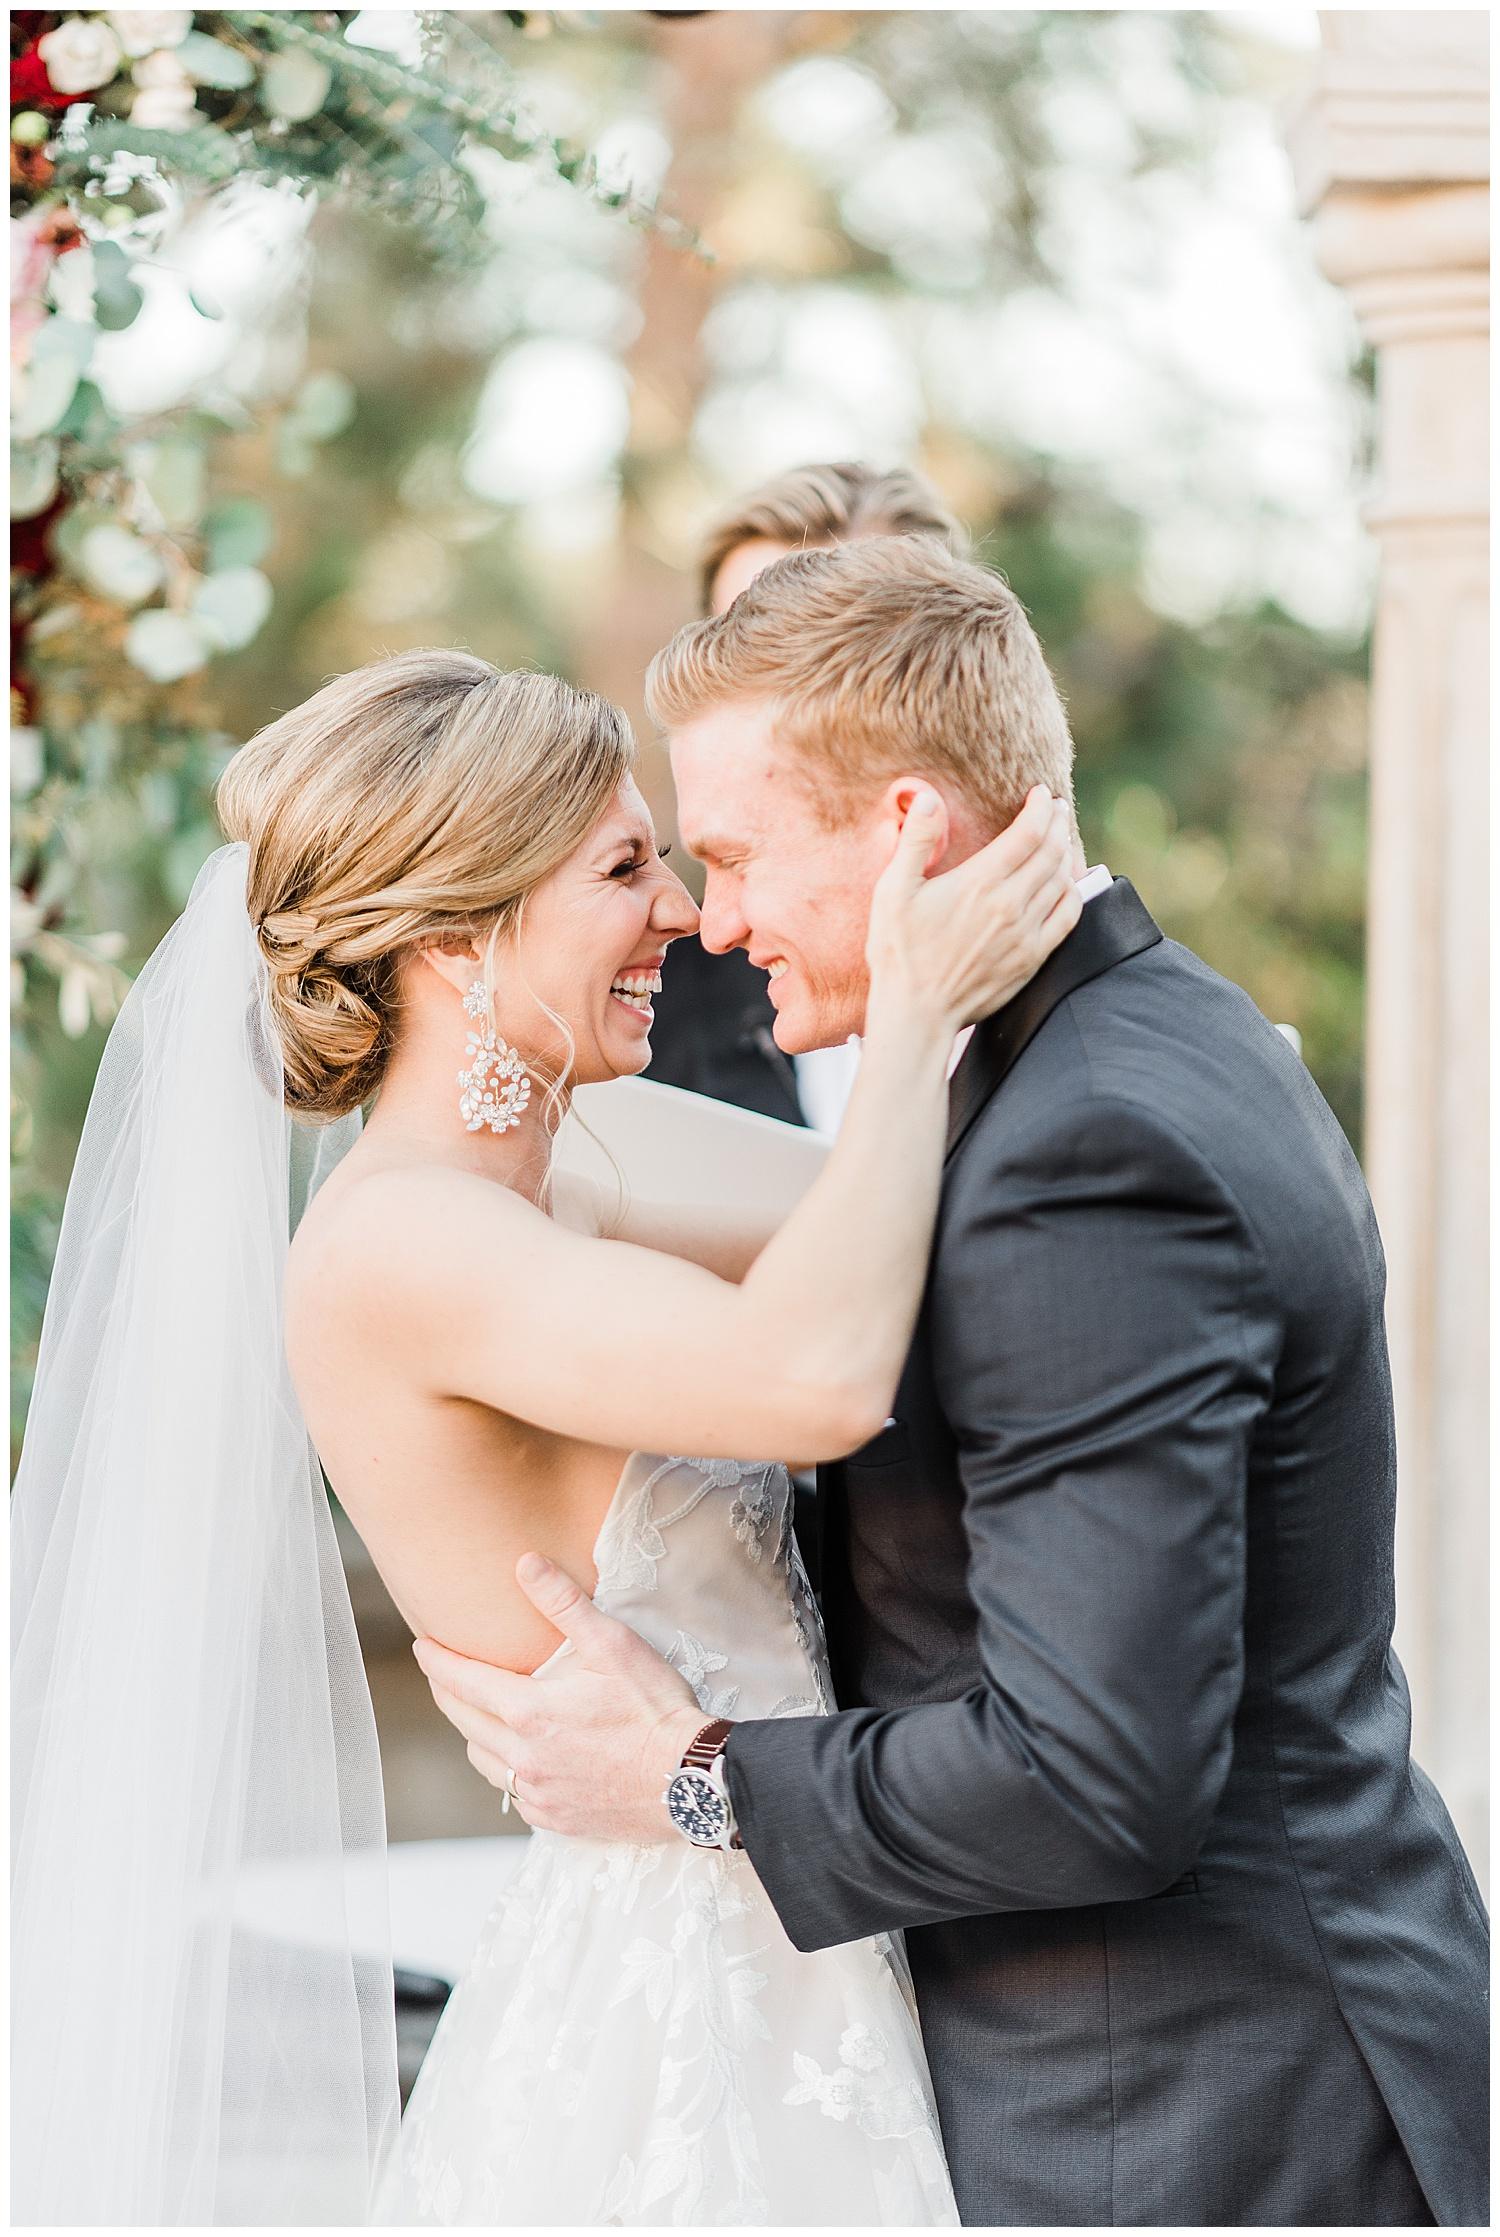 the-prado-balboa-park-wedding-ceremony-first-kiss.jpg